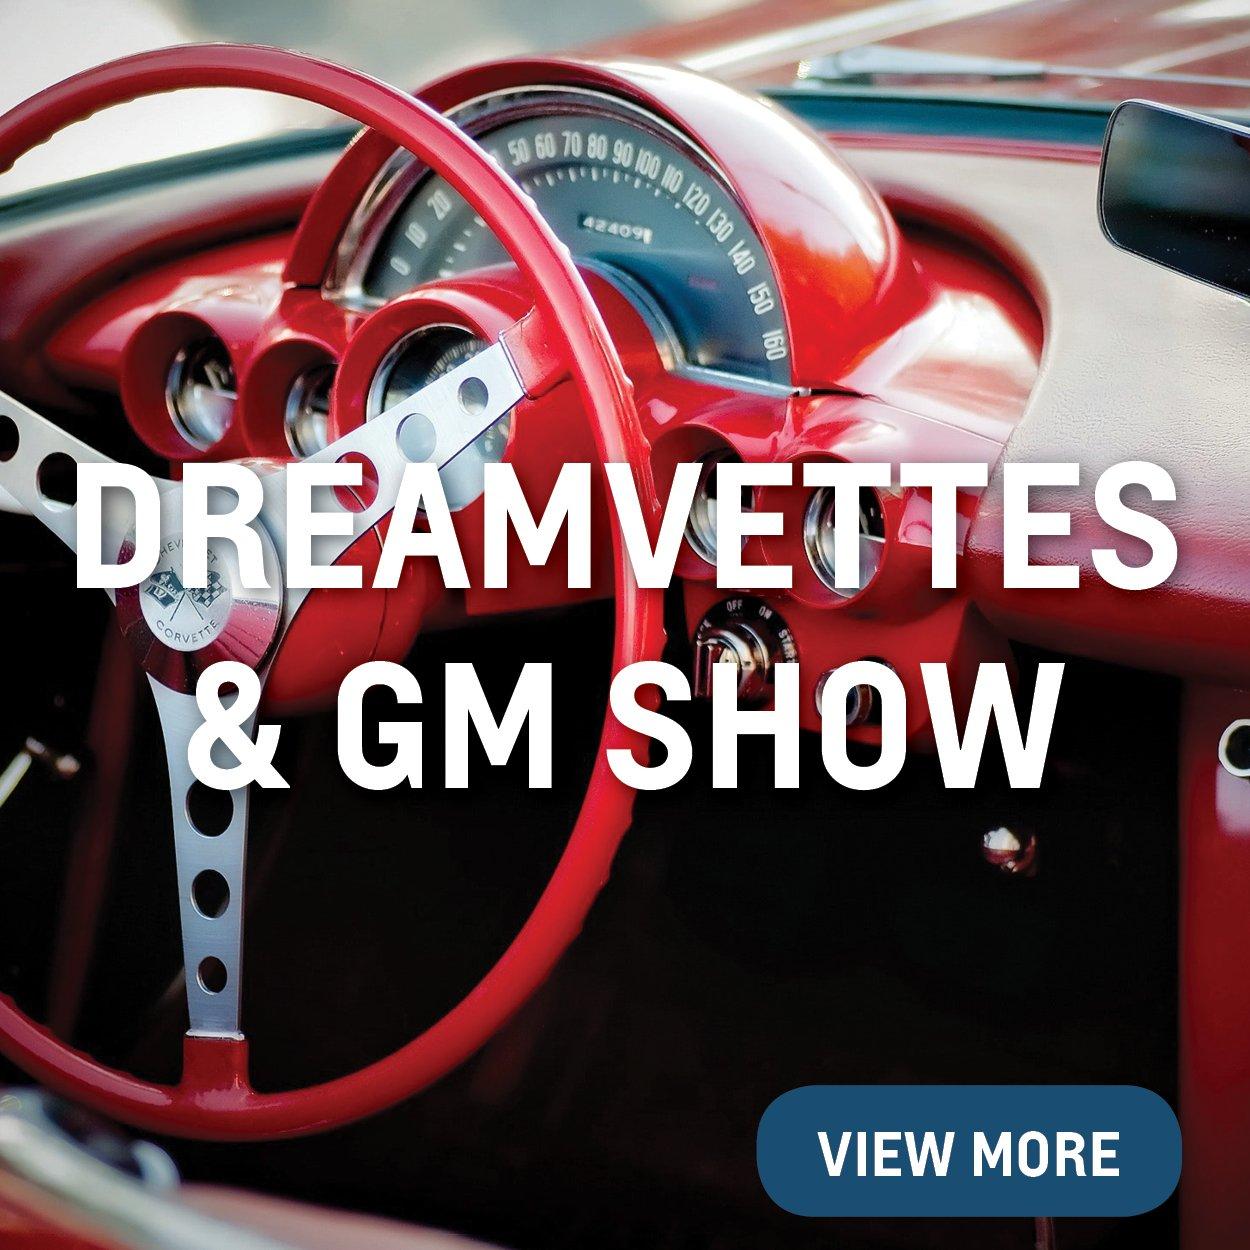 Dreamvettes & GM Show